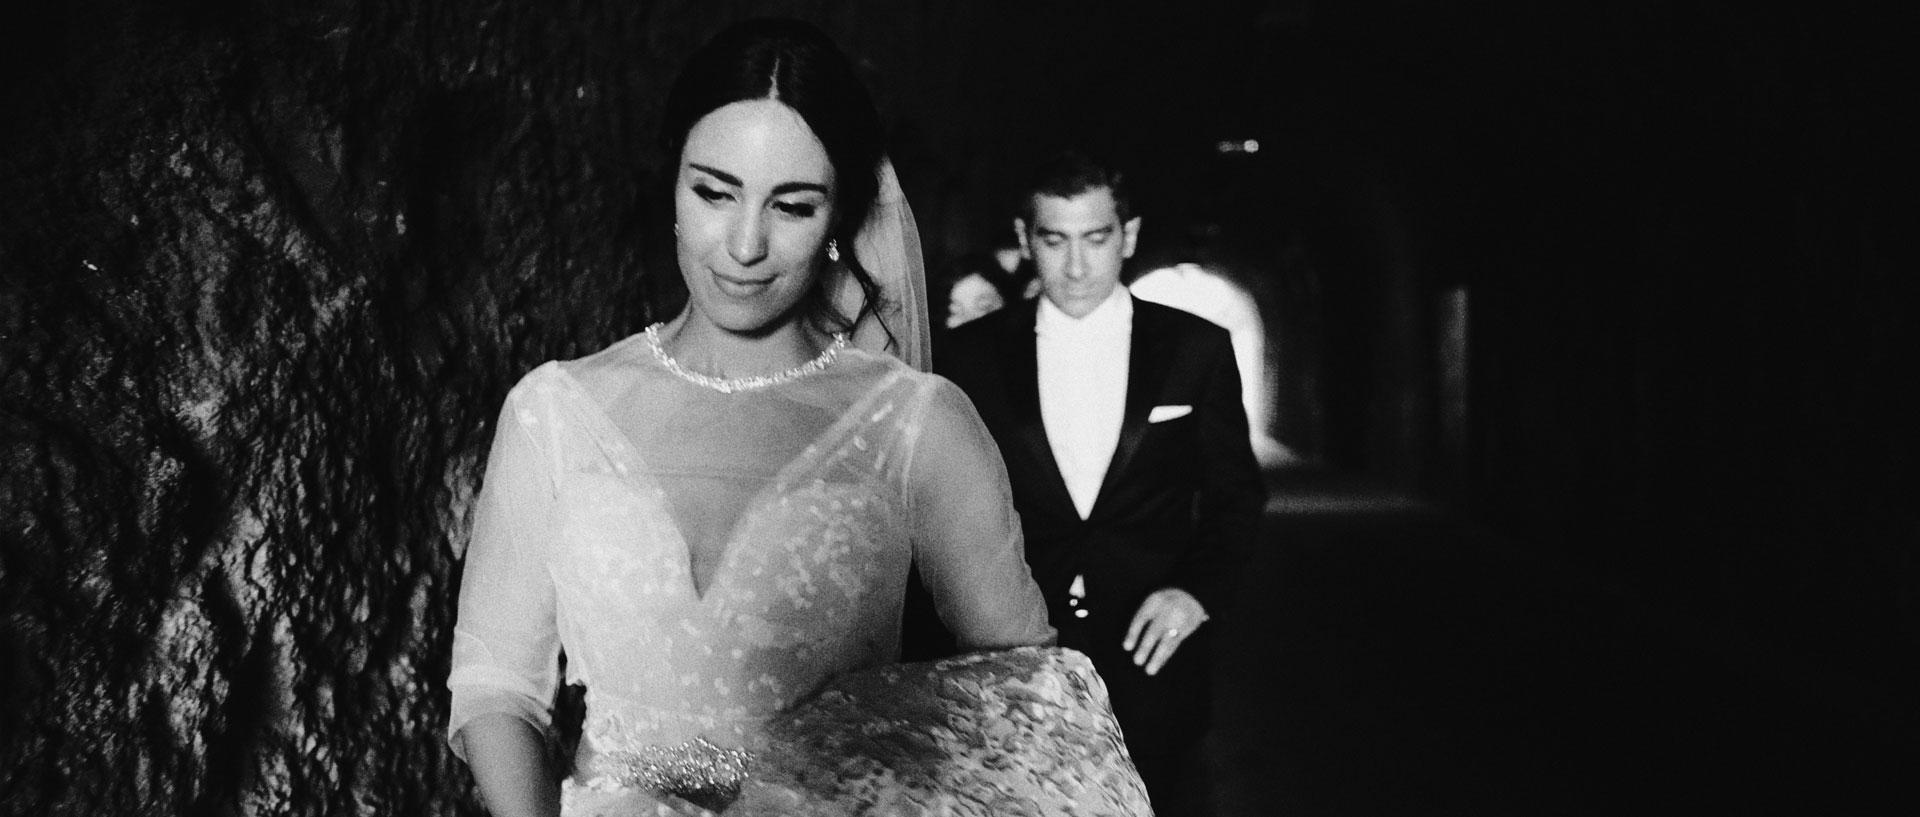 Natasha & Jad Wedding - Casino Biarritz (12).jpg